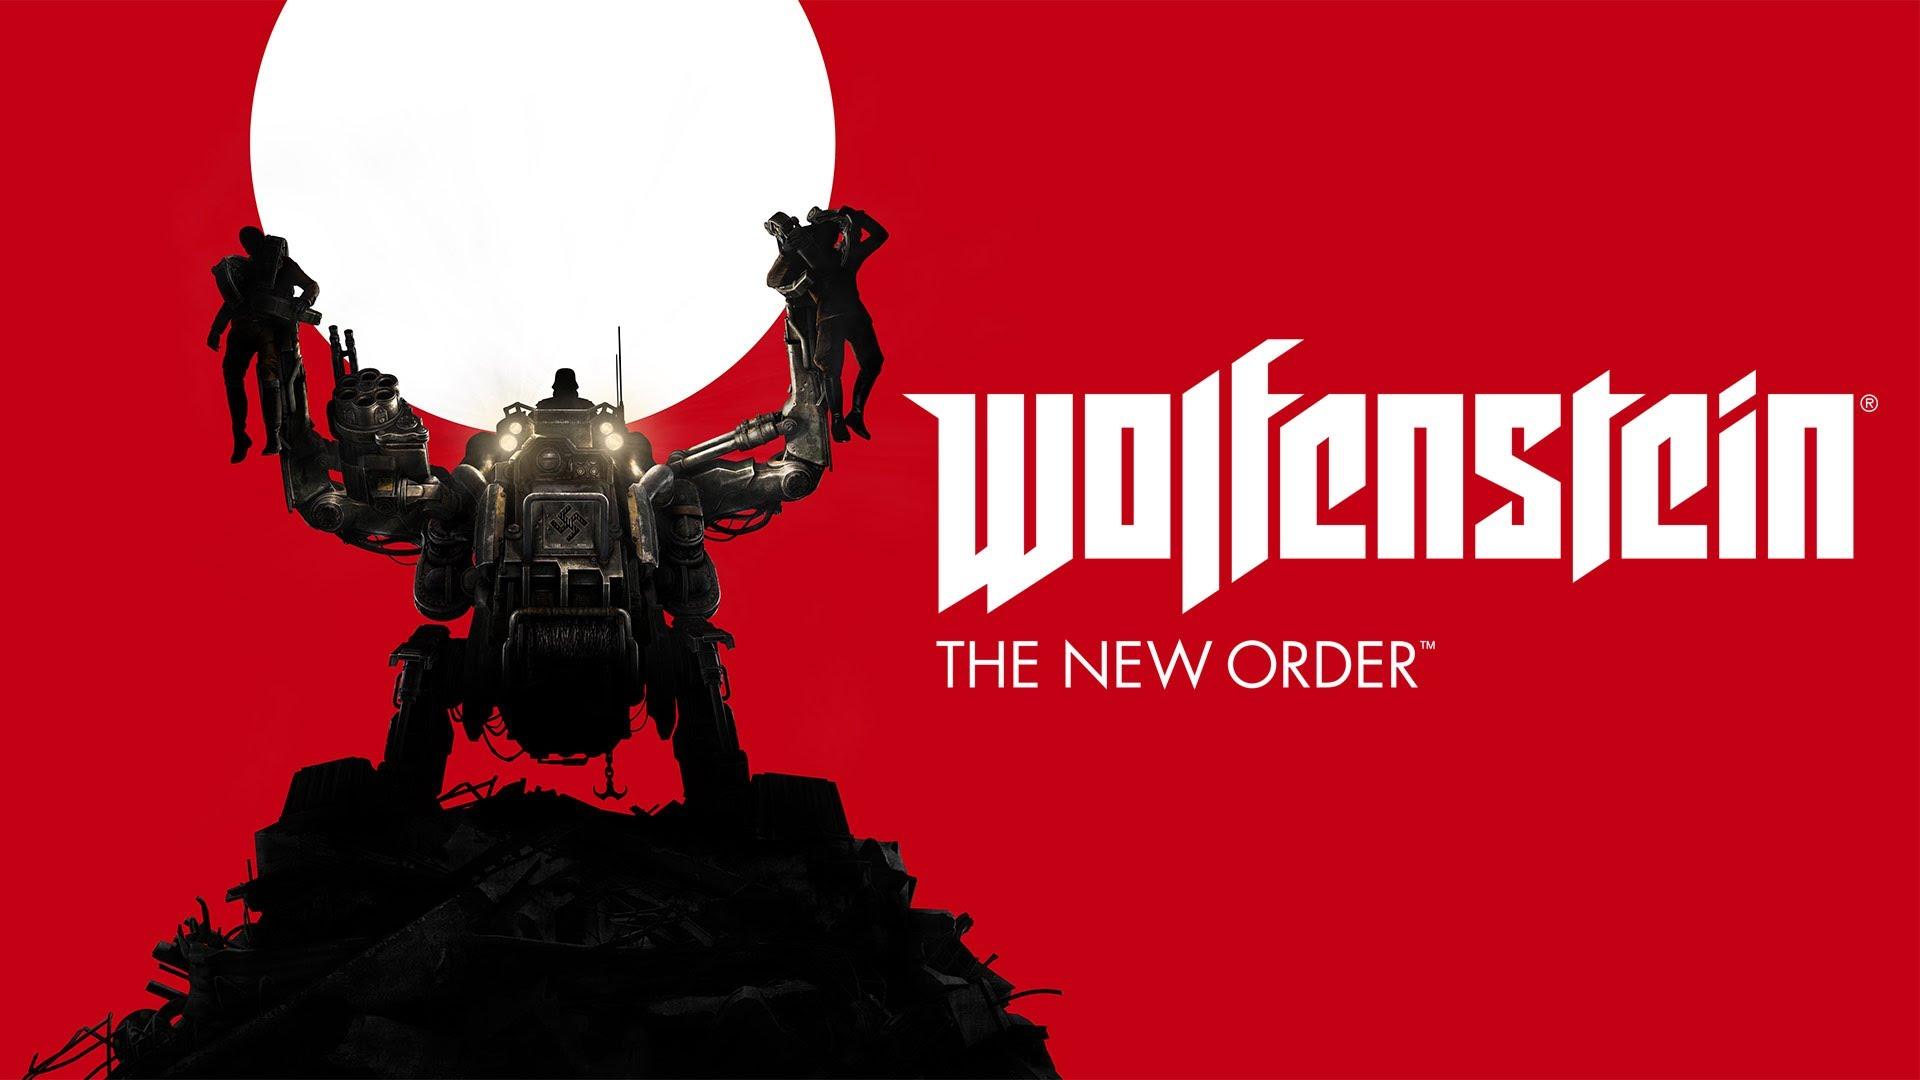 wolfenstein the new order wallpapers